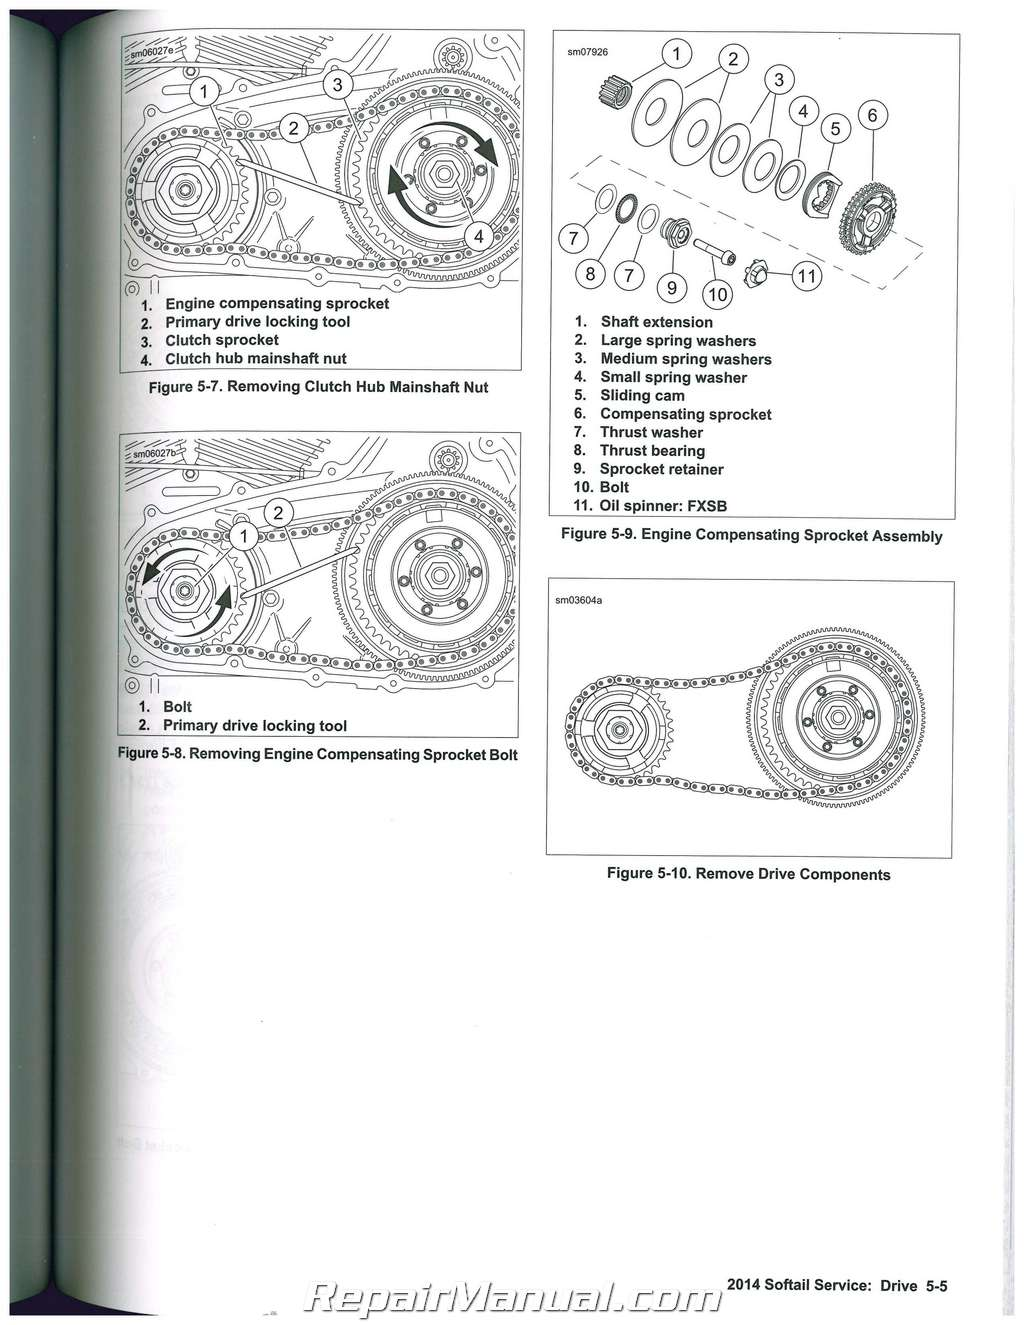 Nissan Sentra Service Manual: CSC(concentric slave cylinder)